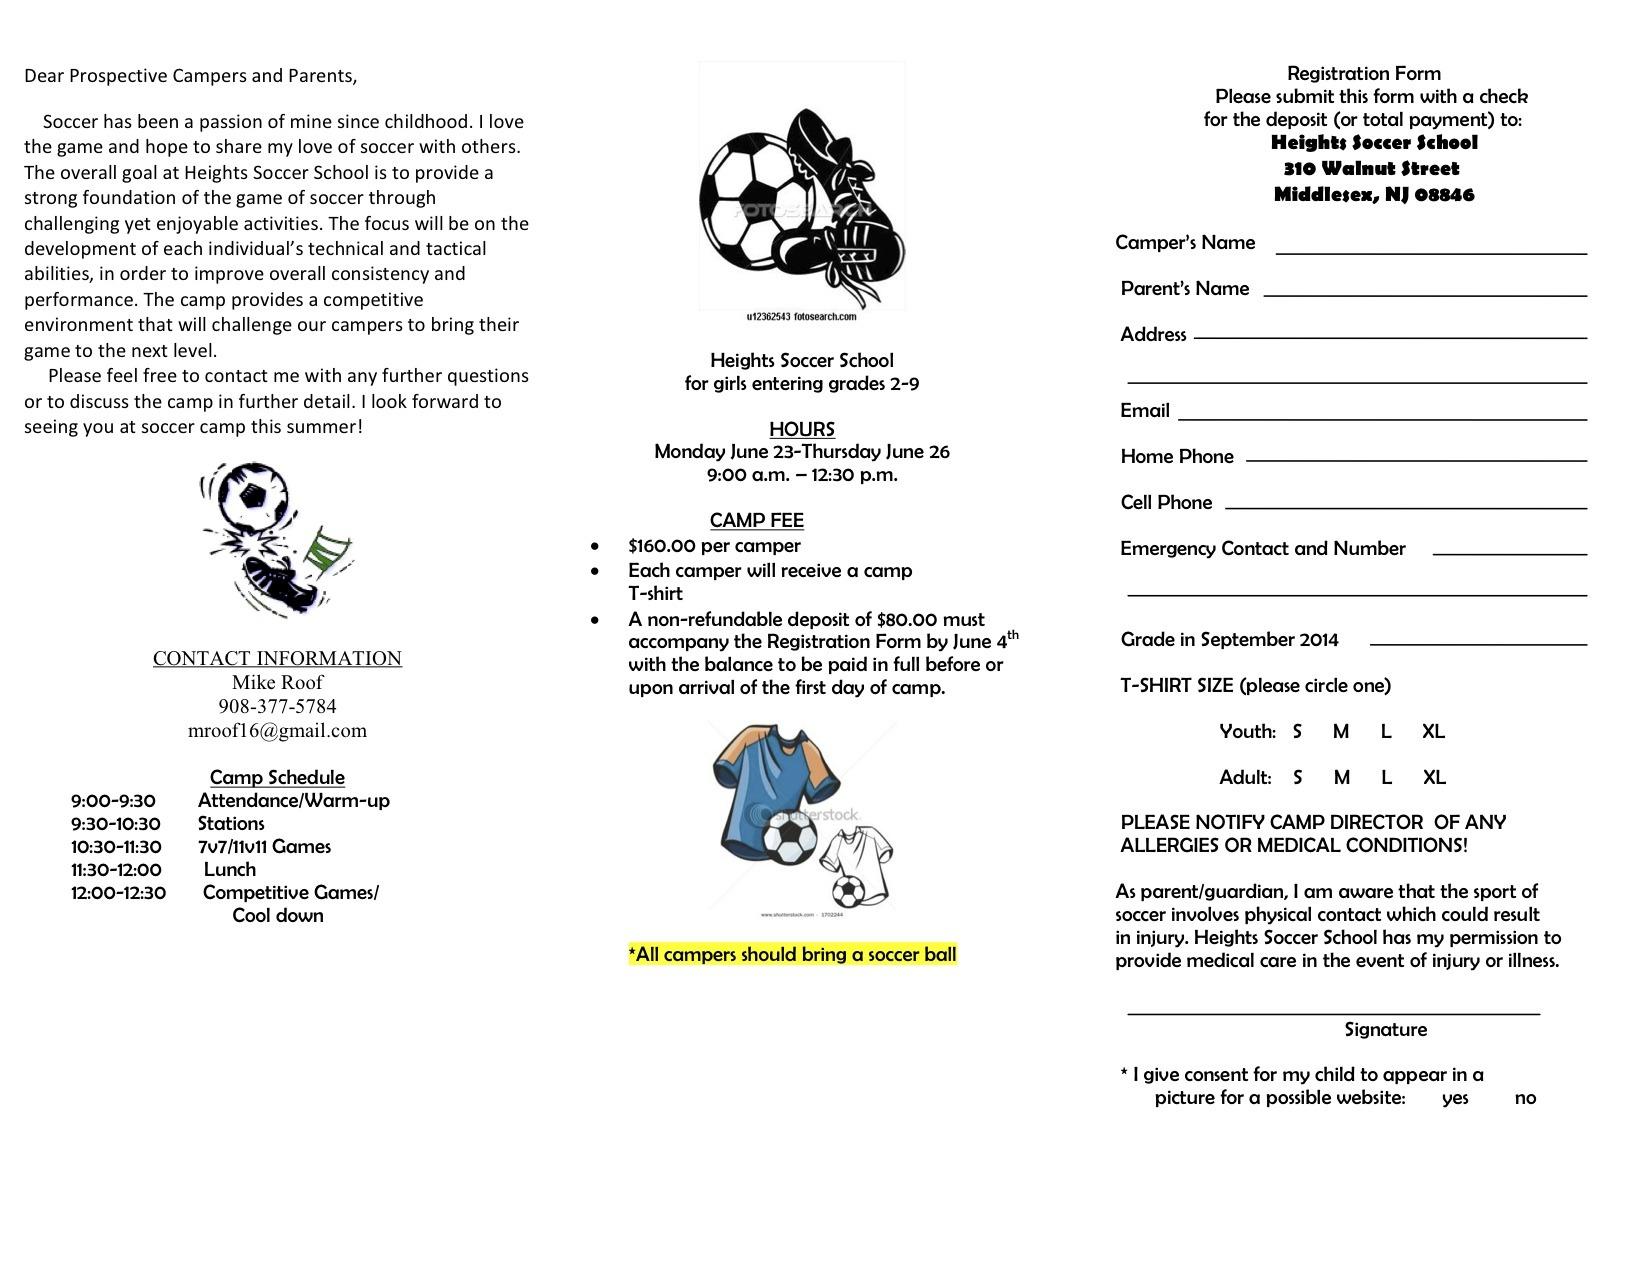 bb9f78d7dd614c7c6868_Heights_Soccer_School_Camp_Brochure_2014.jpg